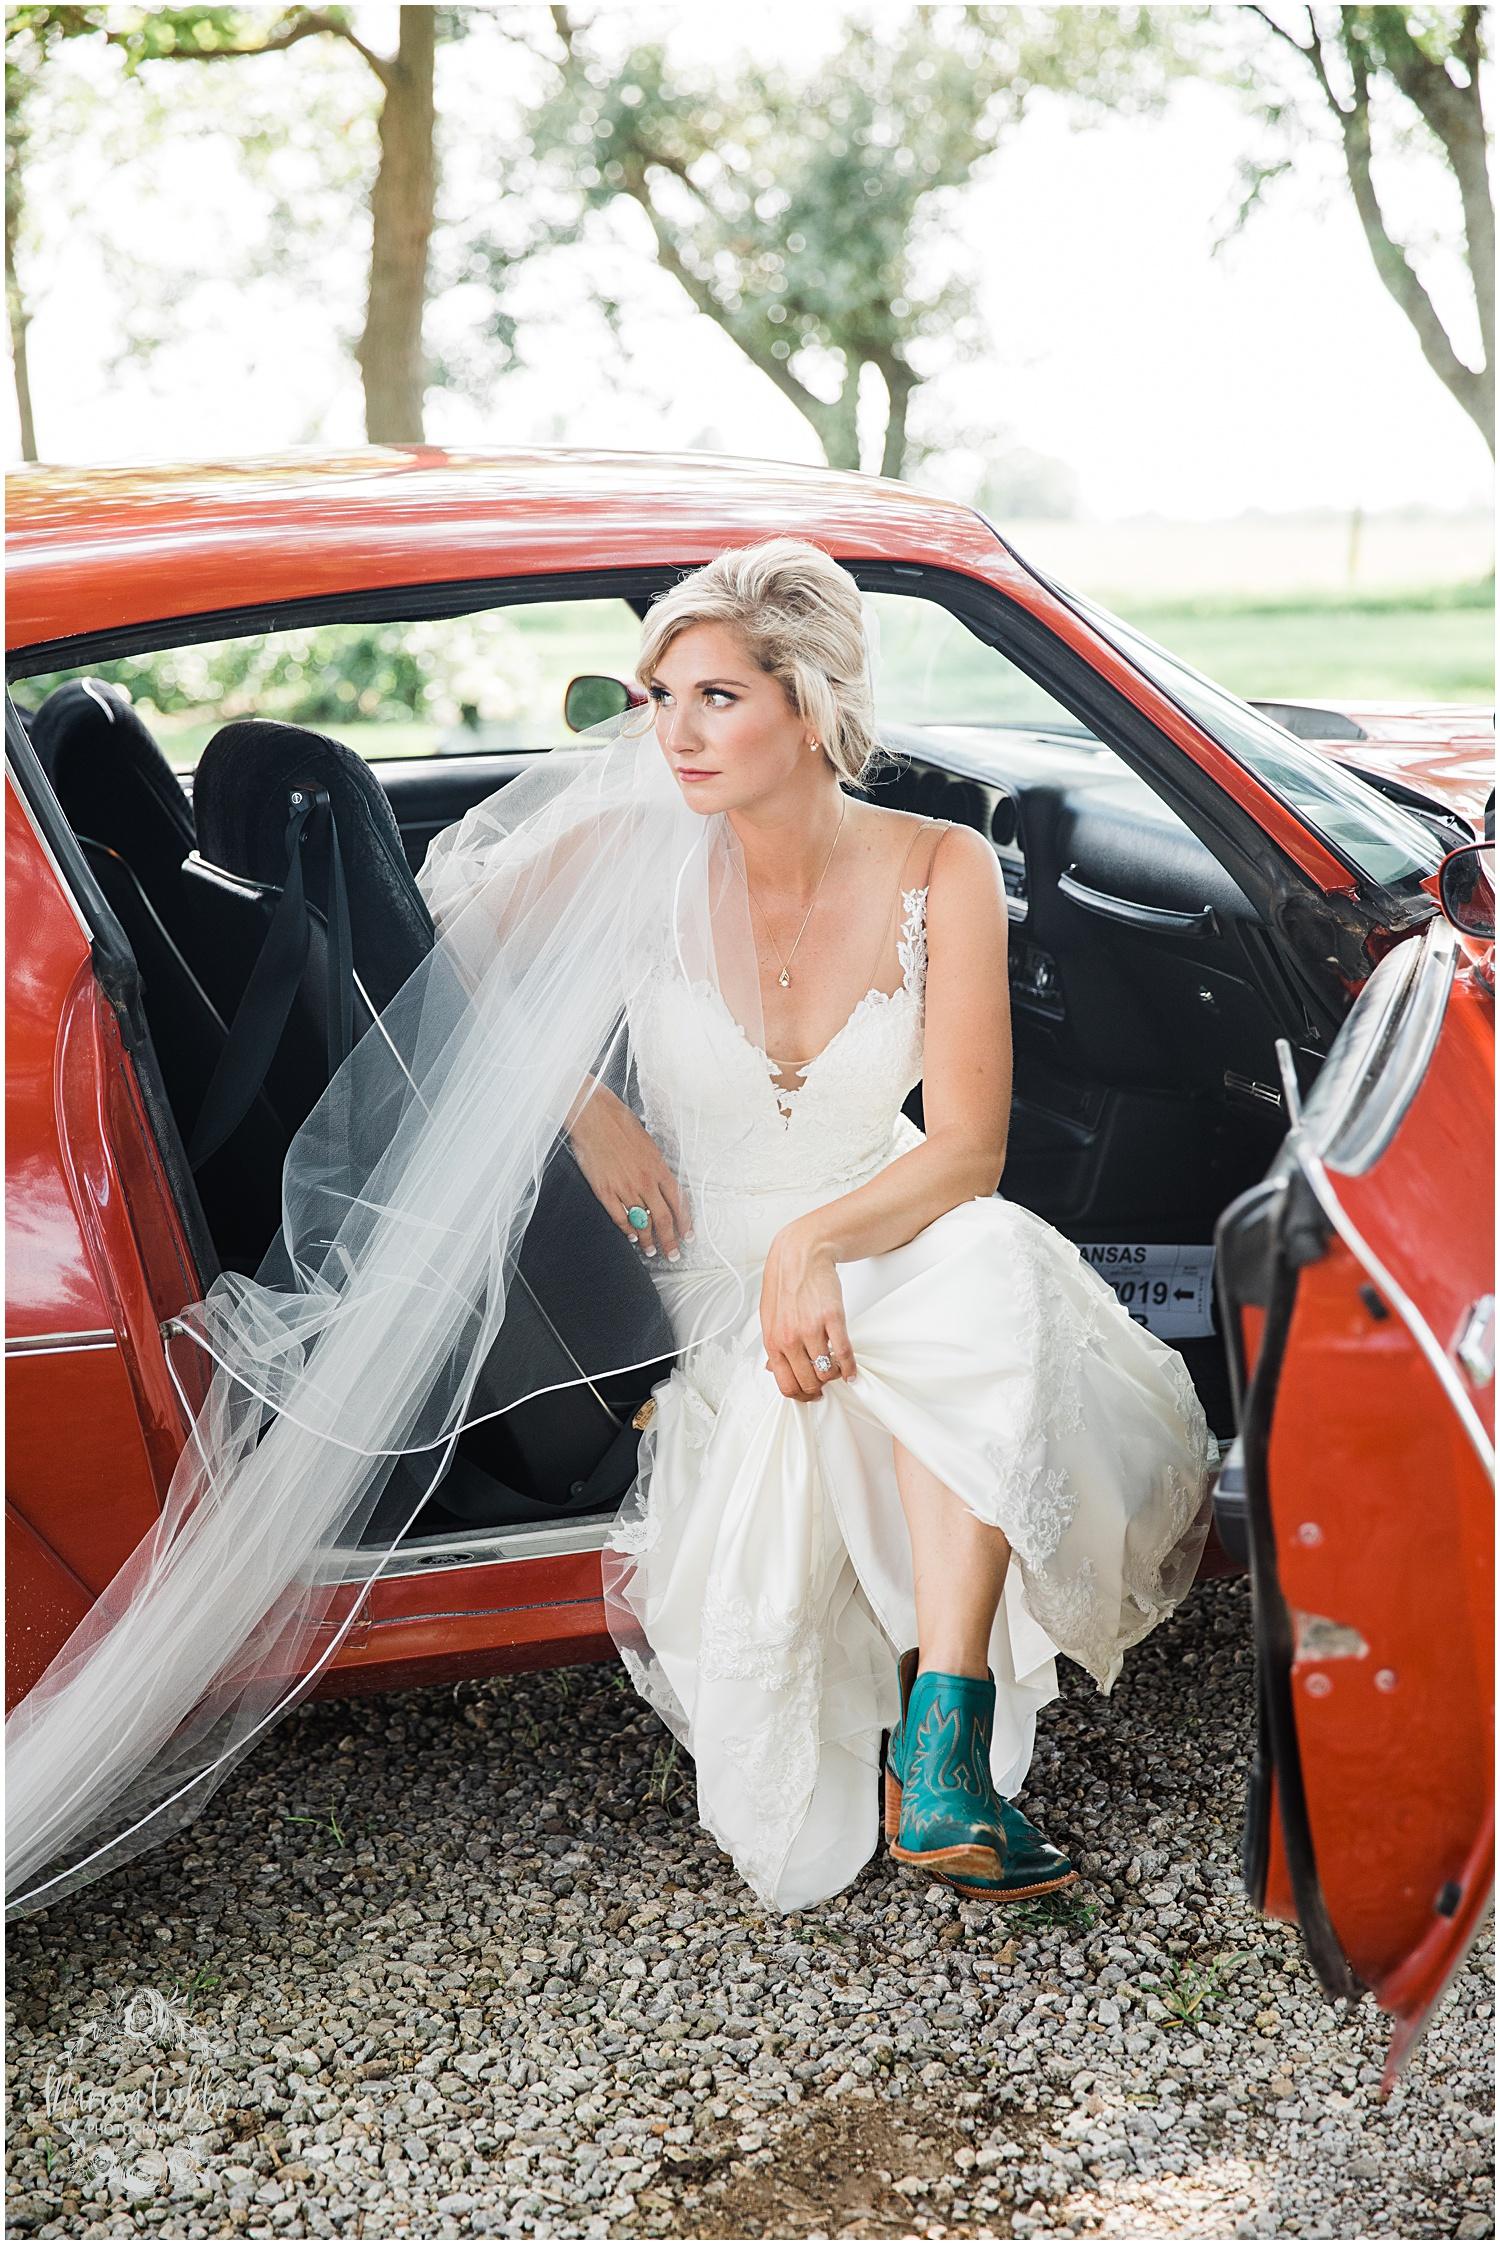 CHELSEA & BEN MARRIED BLOG  | MARISSA CRIBBS PHOTOGRAPHY_8580.jpg